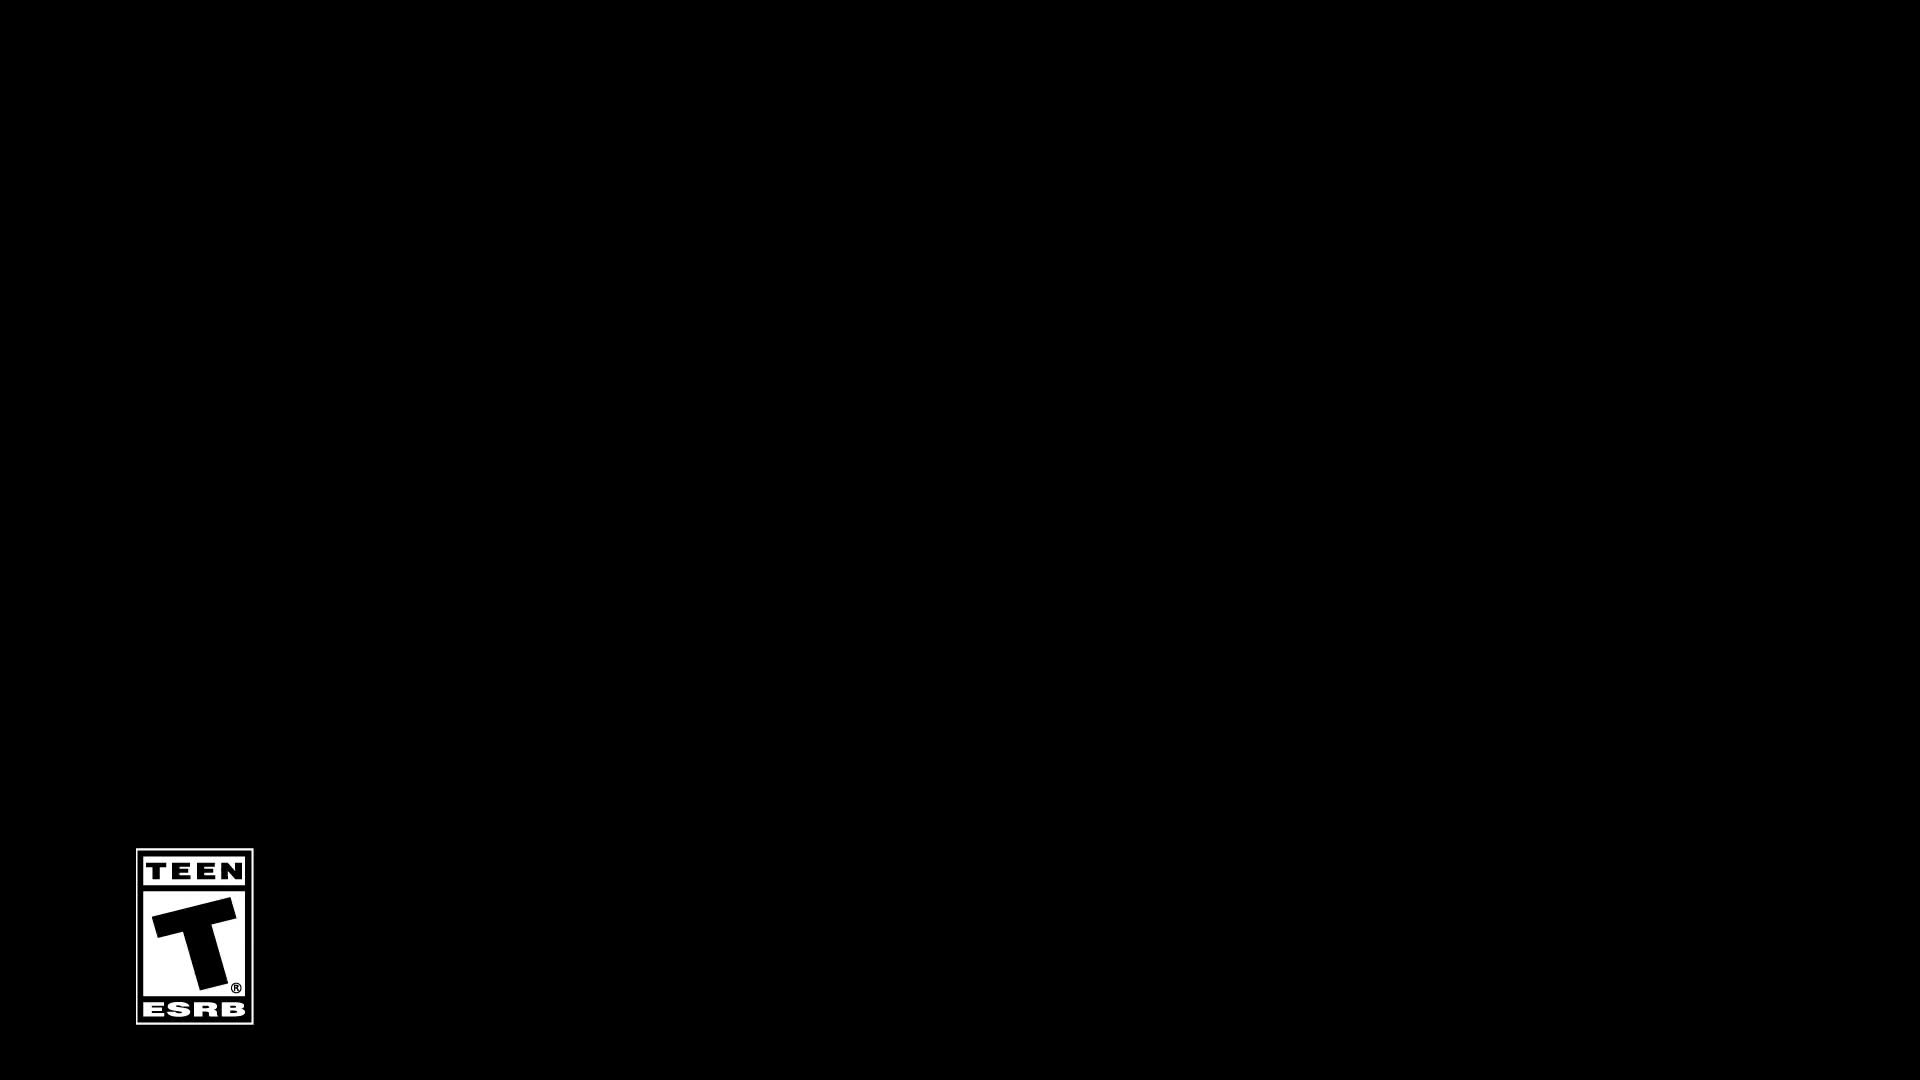 action, adventure, alrest, blades, drivers, fun, game, gameplay, joy con, kids, nintendo, nintendo switch, play, play nintendo, pro controller, rpg, titans, video game, xenoblade chronicles, xenoblade chronicles 2, Xenoblade Chronicles 2 - Nintendo Switch - Nintendo Direct 9.13.2017 GIFs